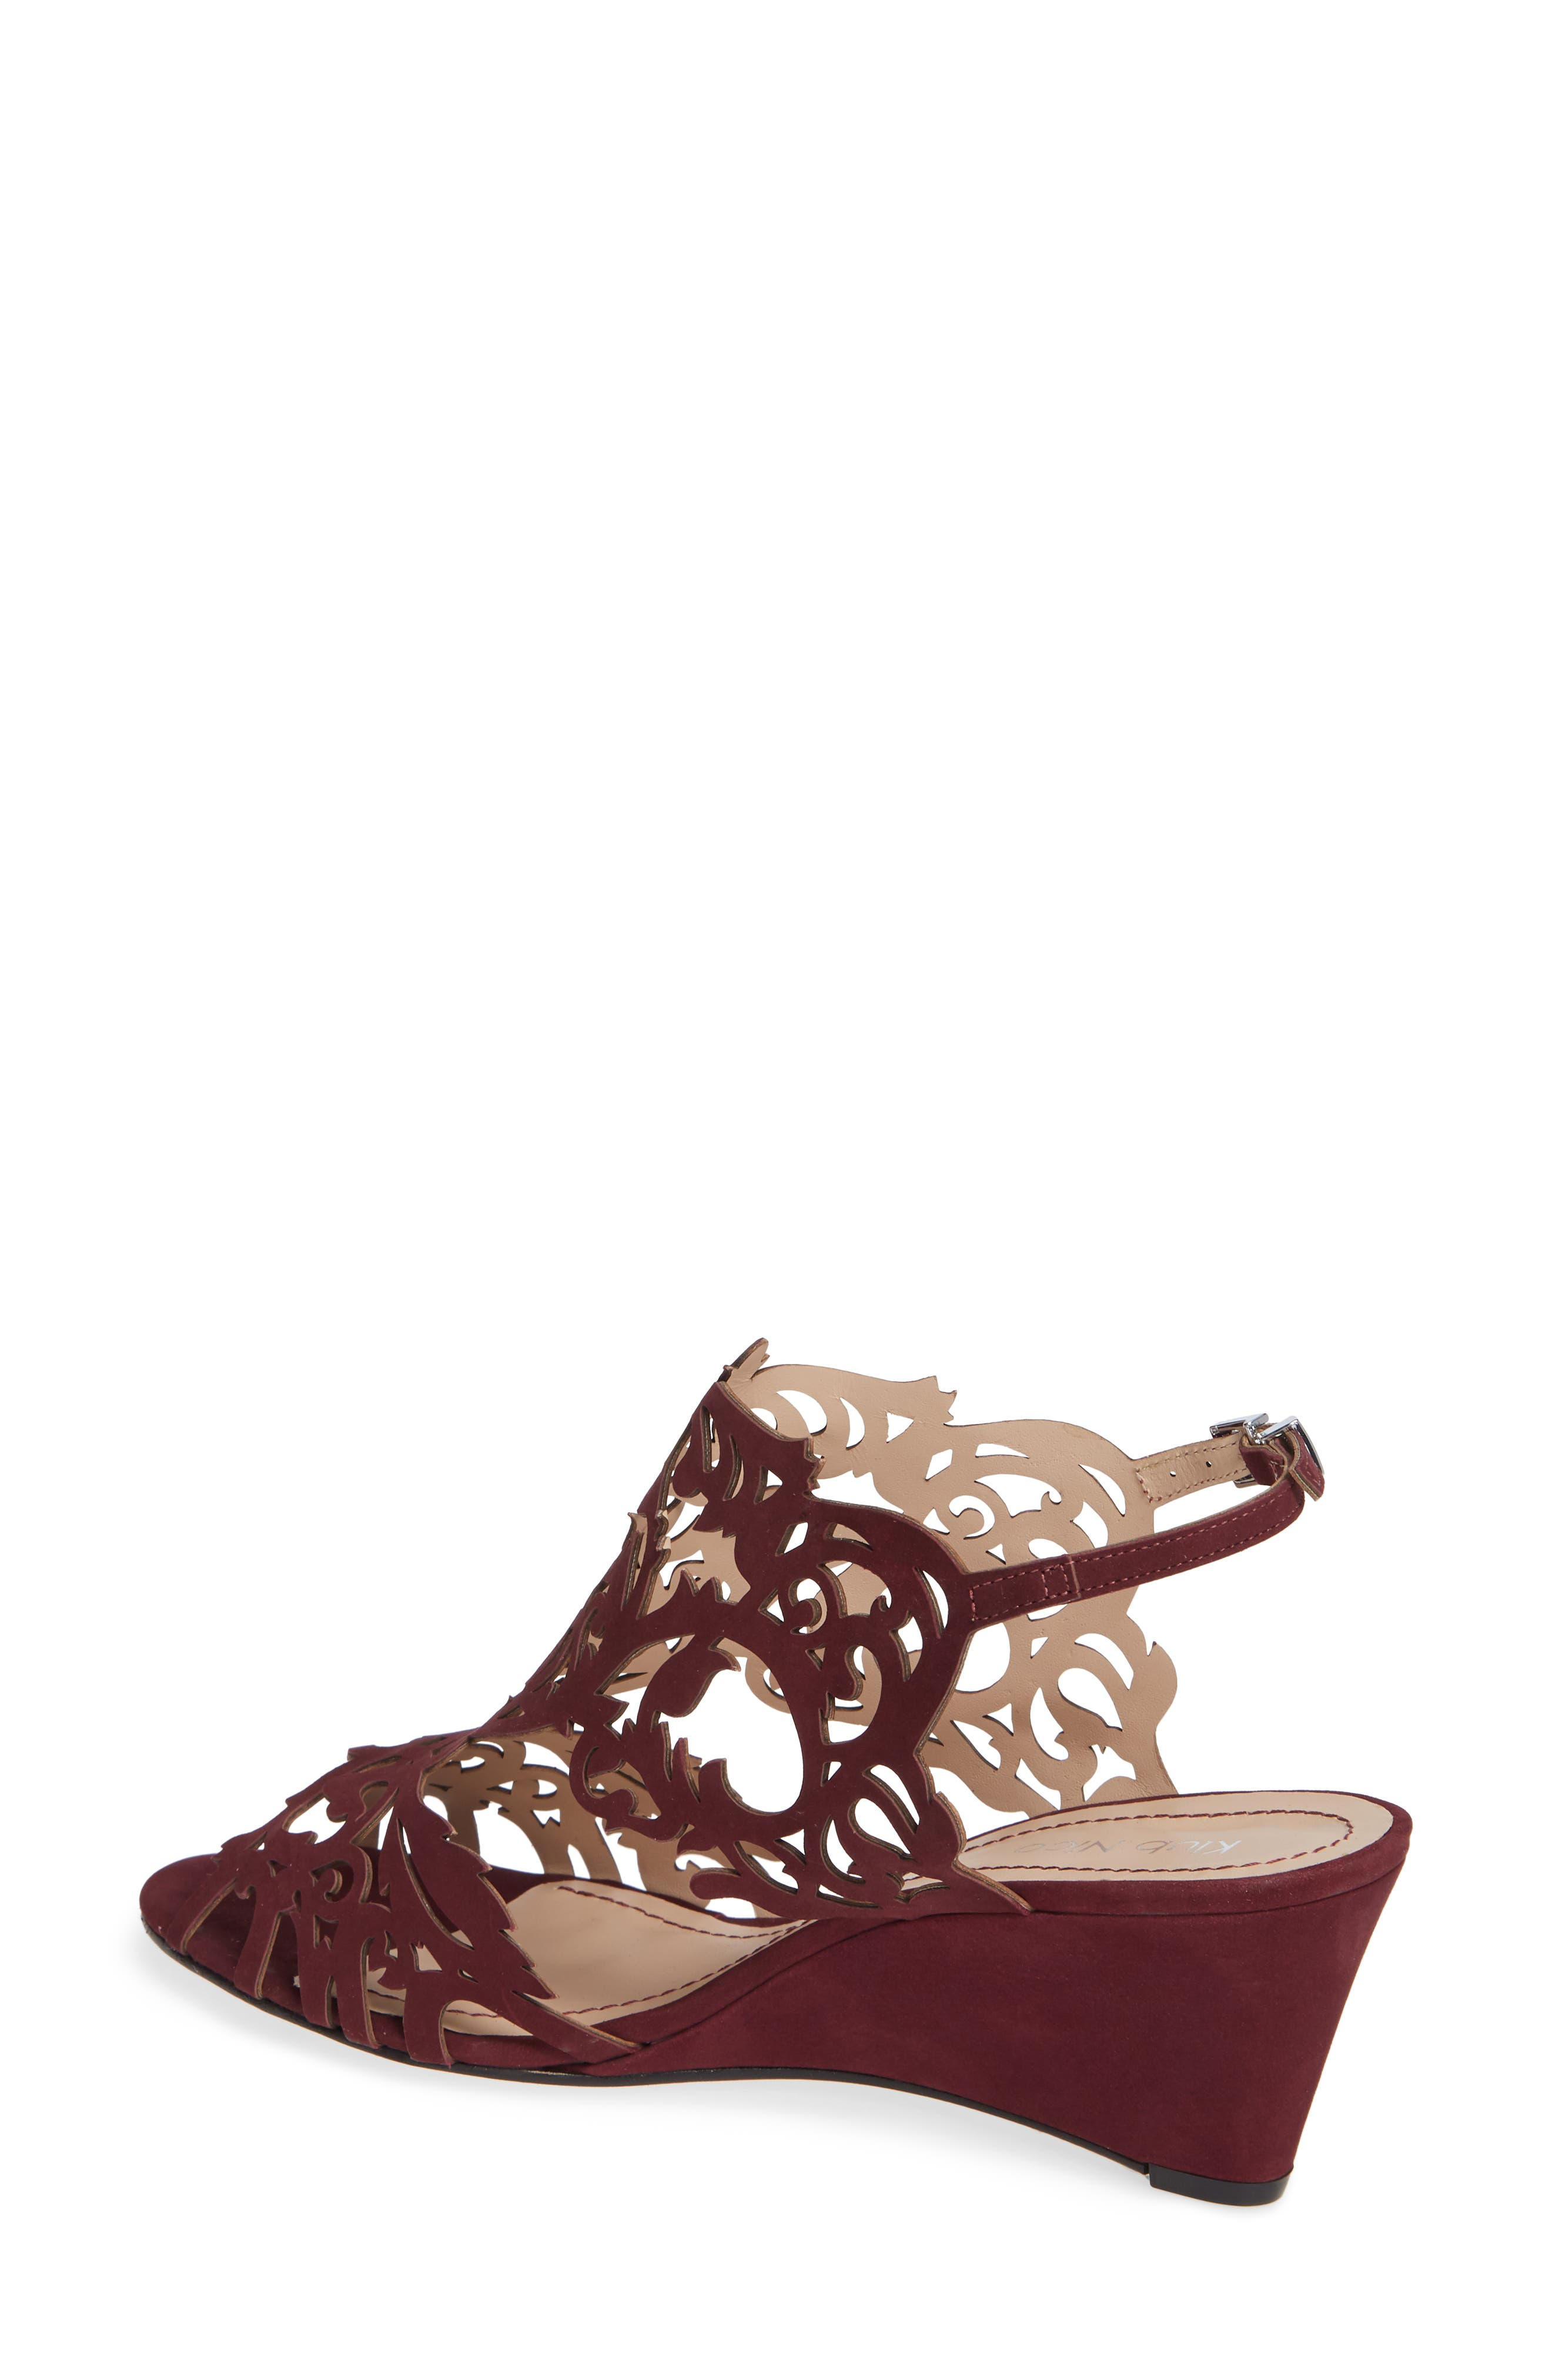 Marcela Laser Cutout Wedge Sandal,                             Alternate thumbnail 2, color,                             WINE LEATHER